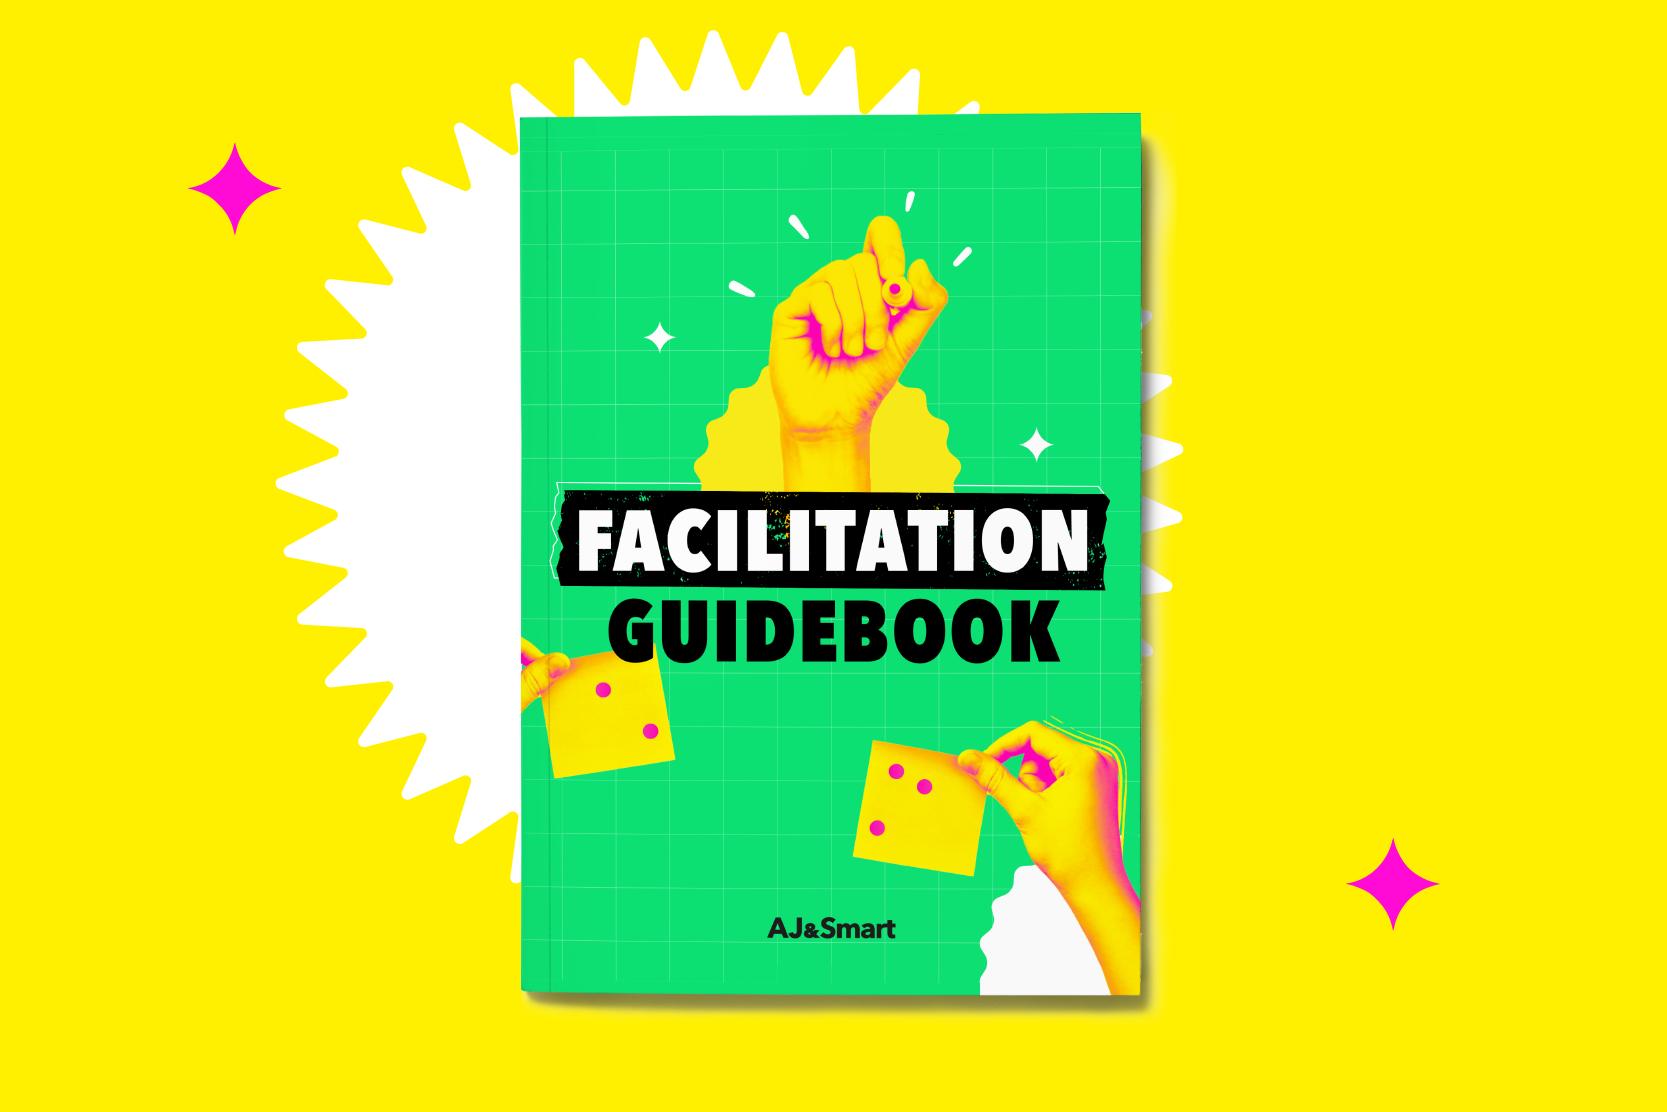 Facilitation Guidebook